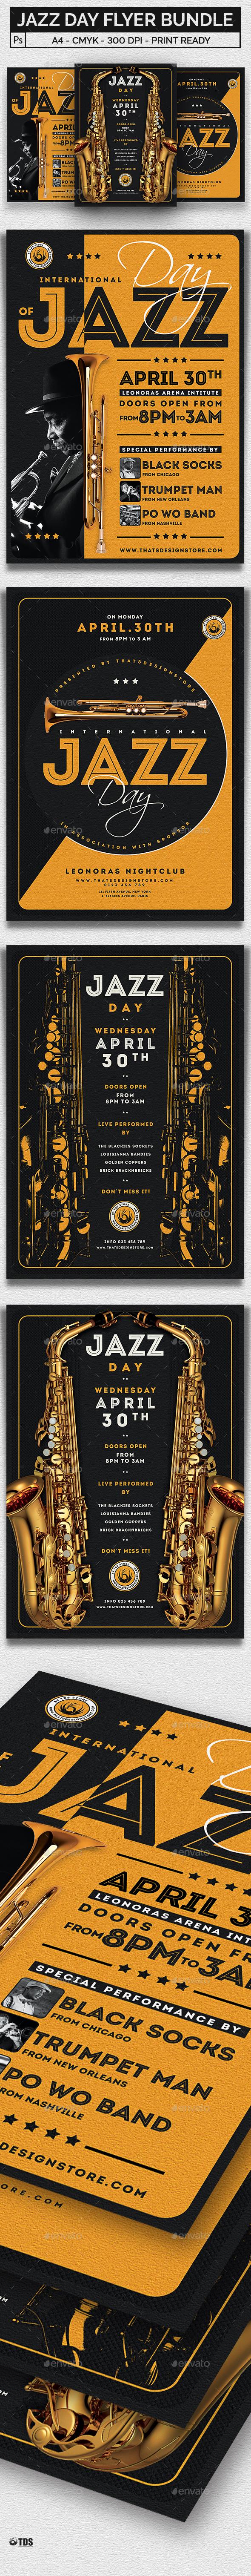 Jazz Day Flyer Bundle - Concerts Events